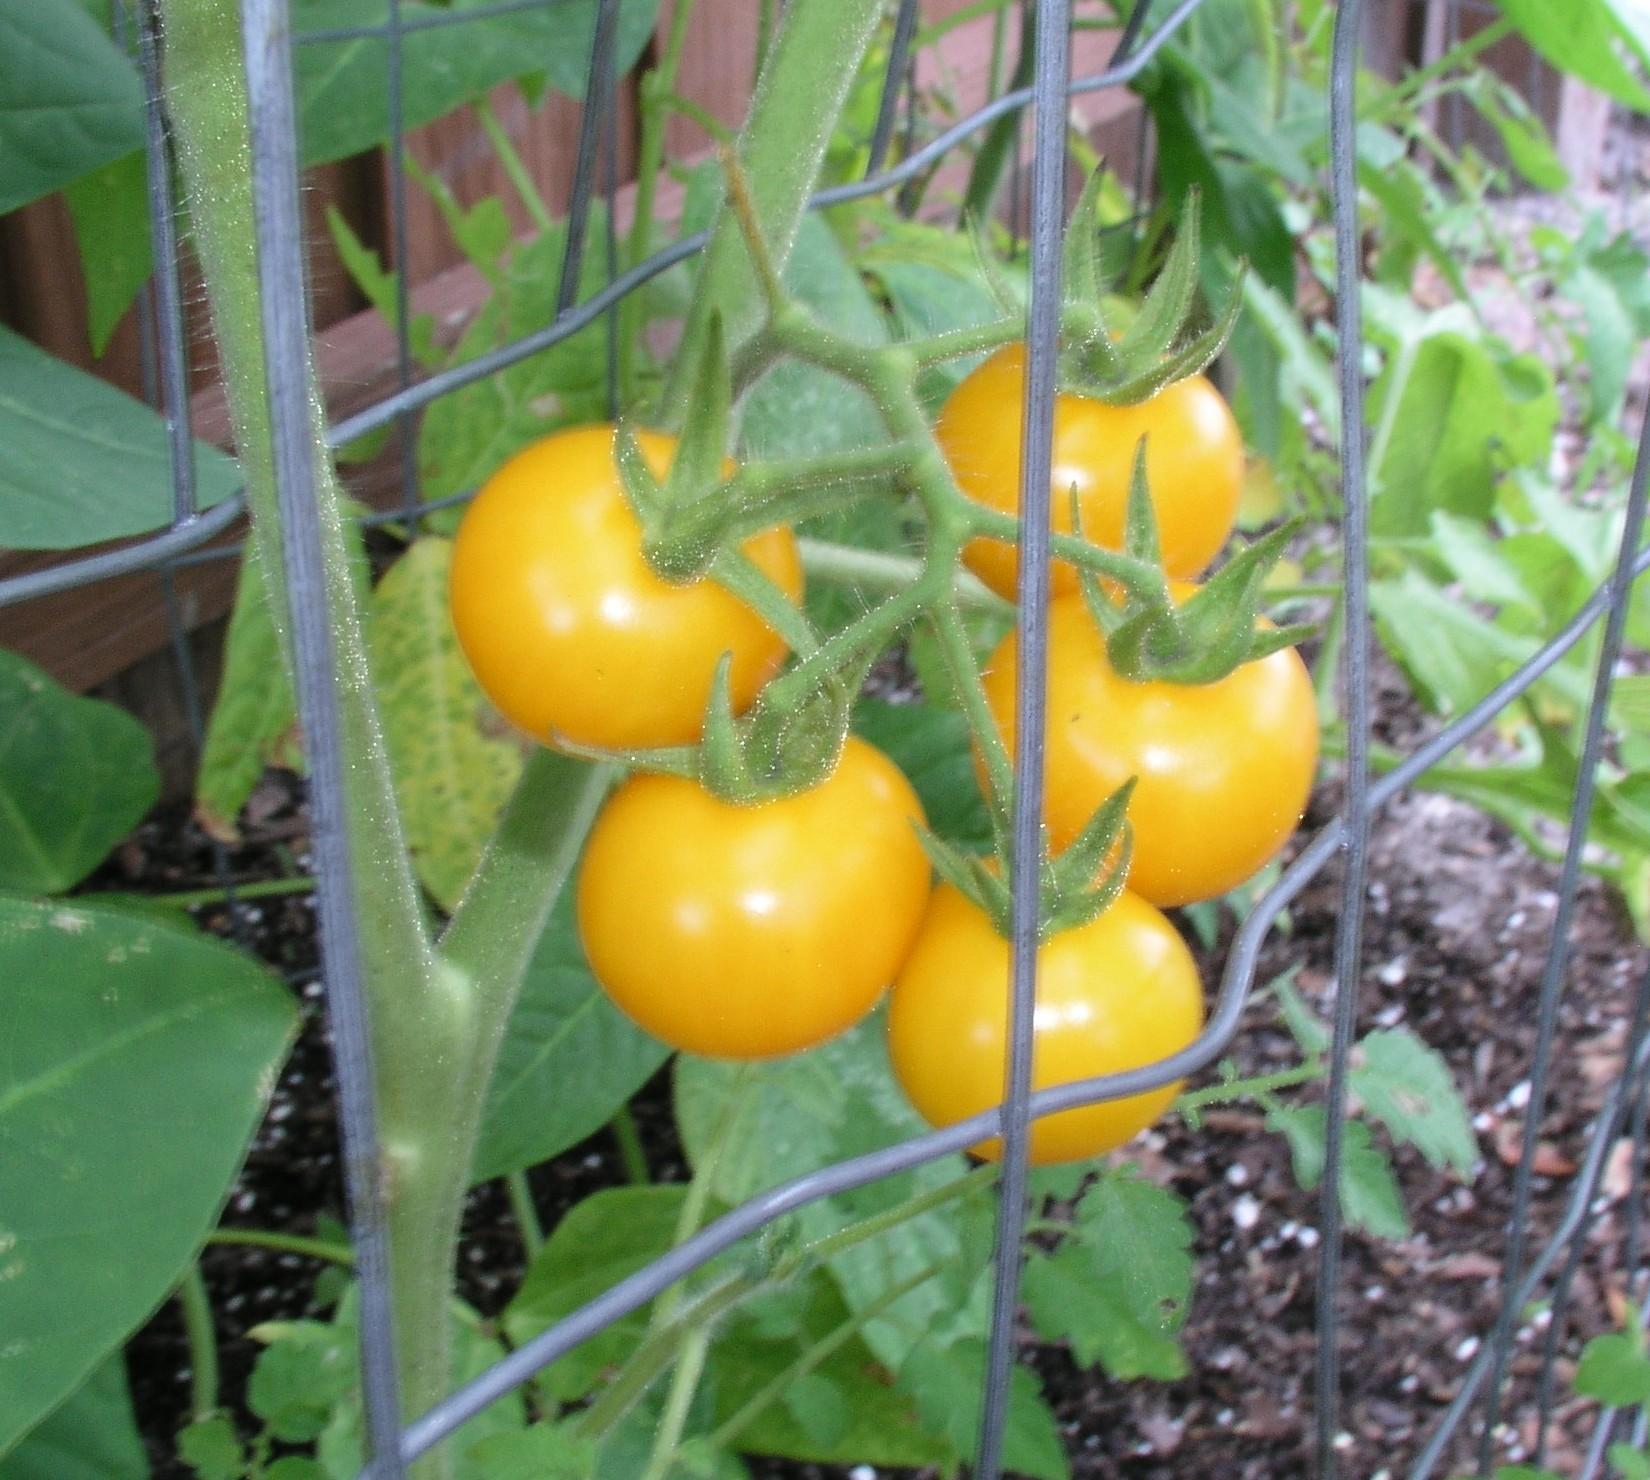 home shop seeds tomato seeds egg yolk tomato